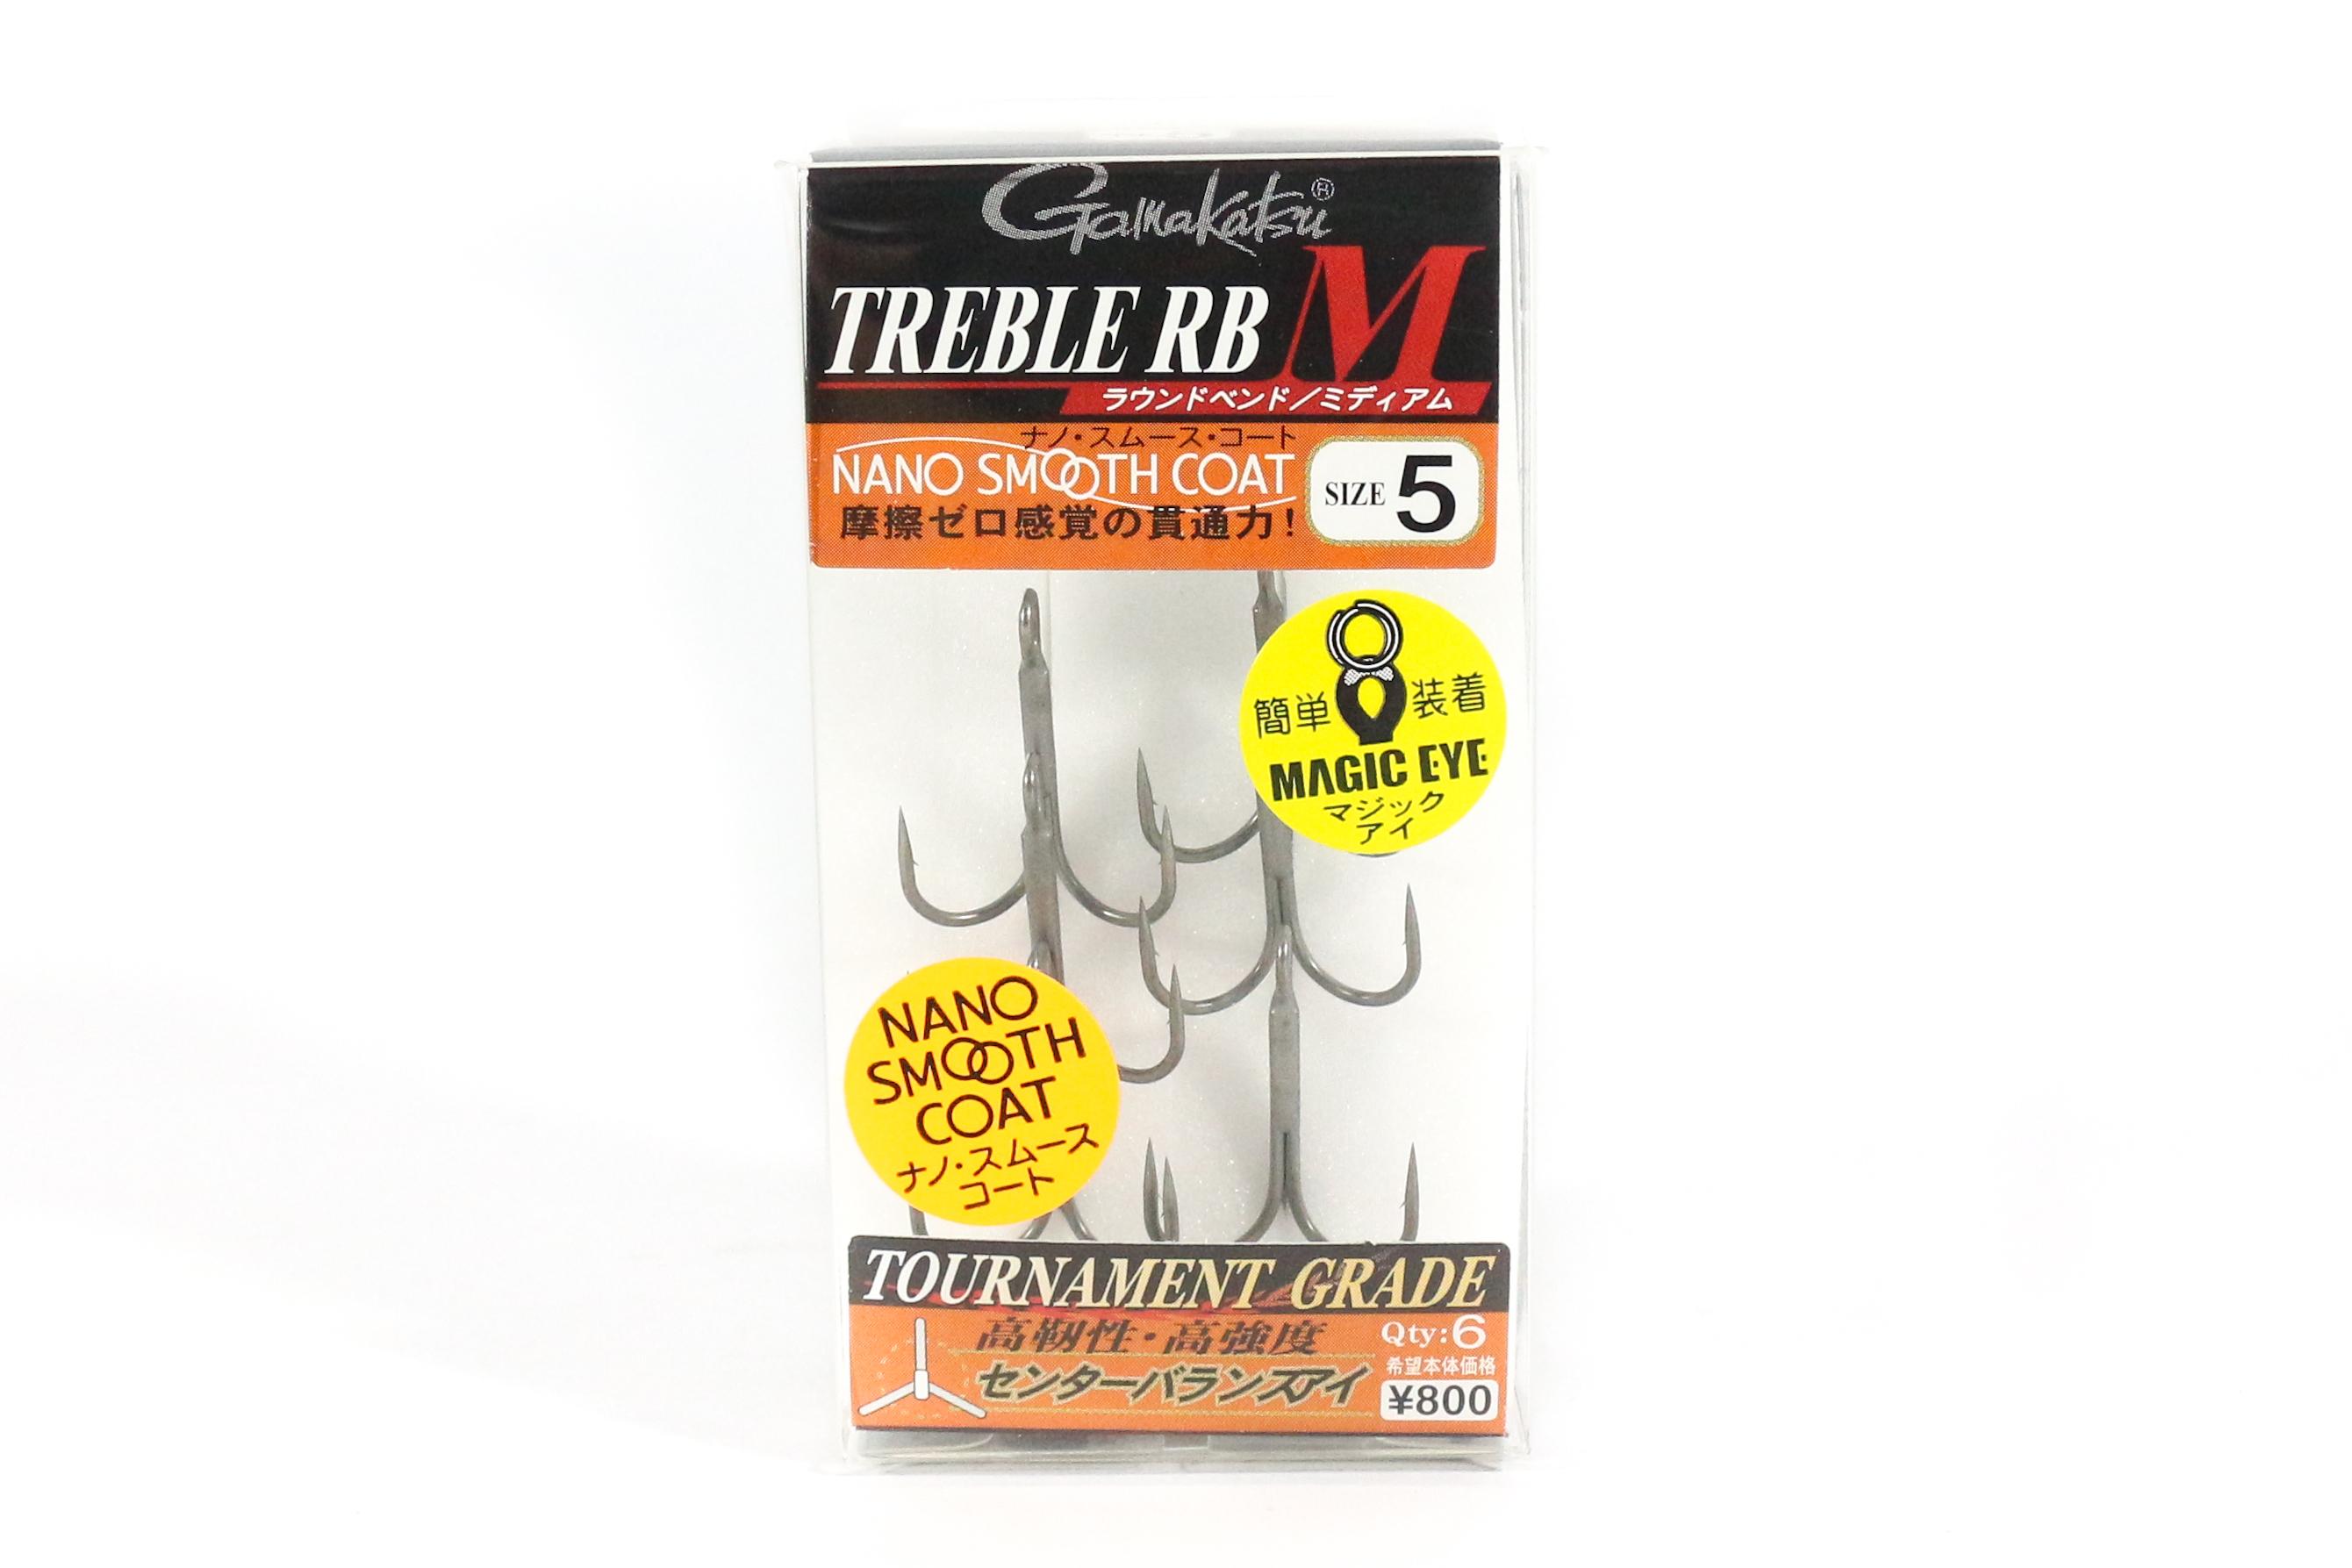 Gamakatsu Treble Hook RB M Nano Coat Size 5 (4660)